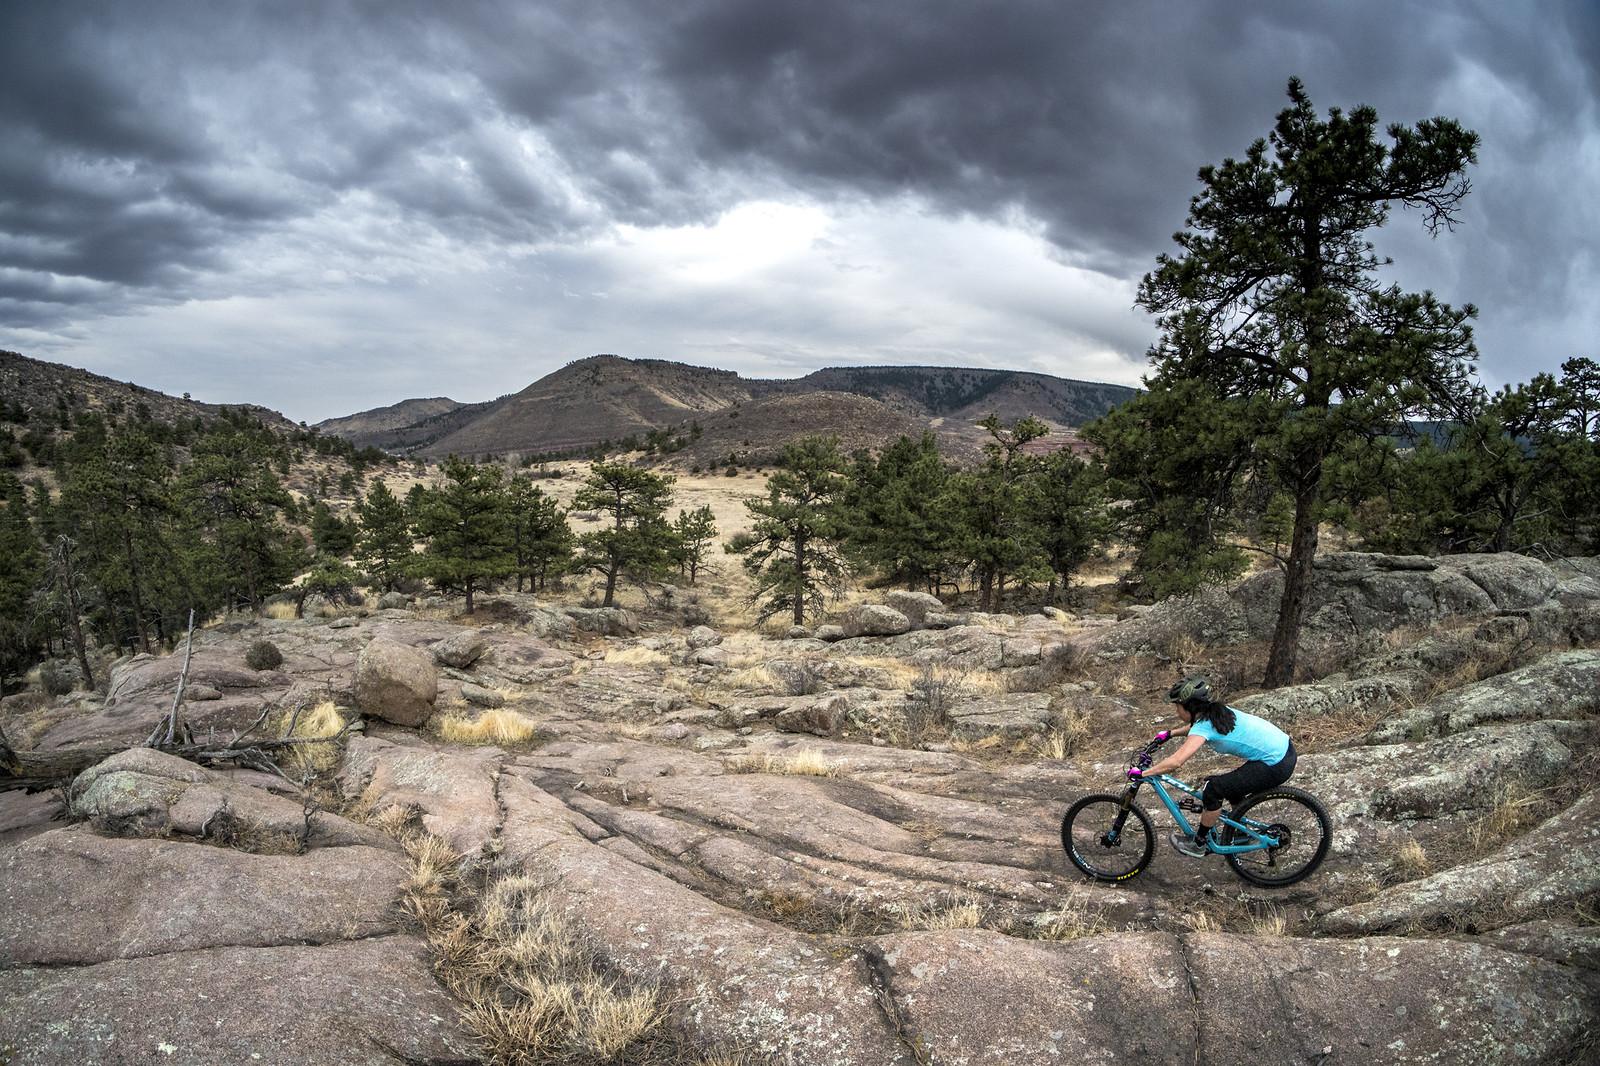 Rock slabs in CO - gold_007 - Mountain Biking Pictures - Vital MTB